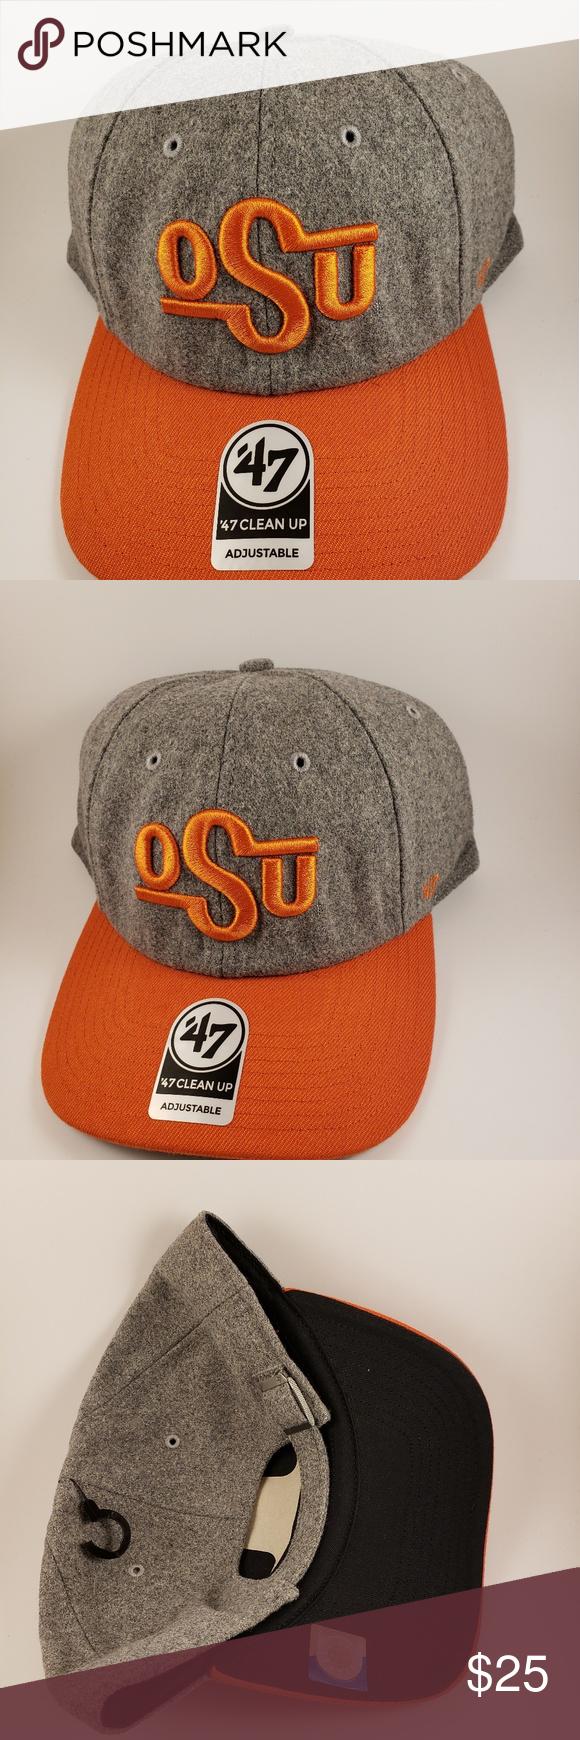 1b188e97bf8 Oklahoma State University Cowboys Hat NWT OKU Cowboys OSFA Brand  47  Oklahoma State Accessories Hats